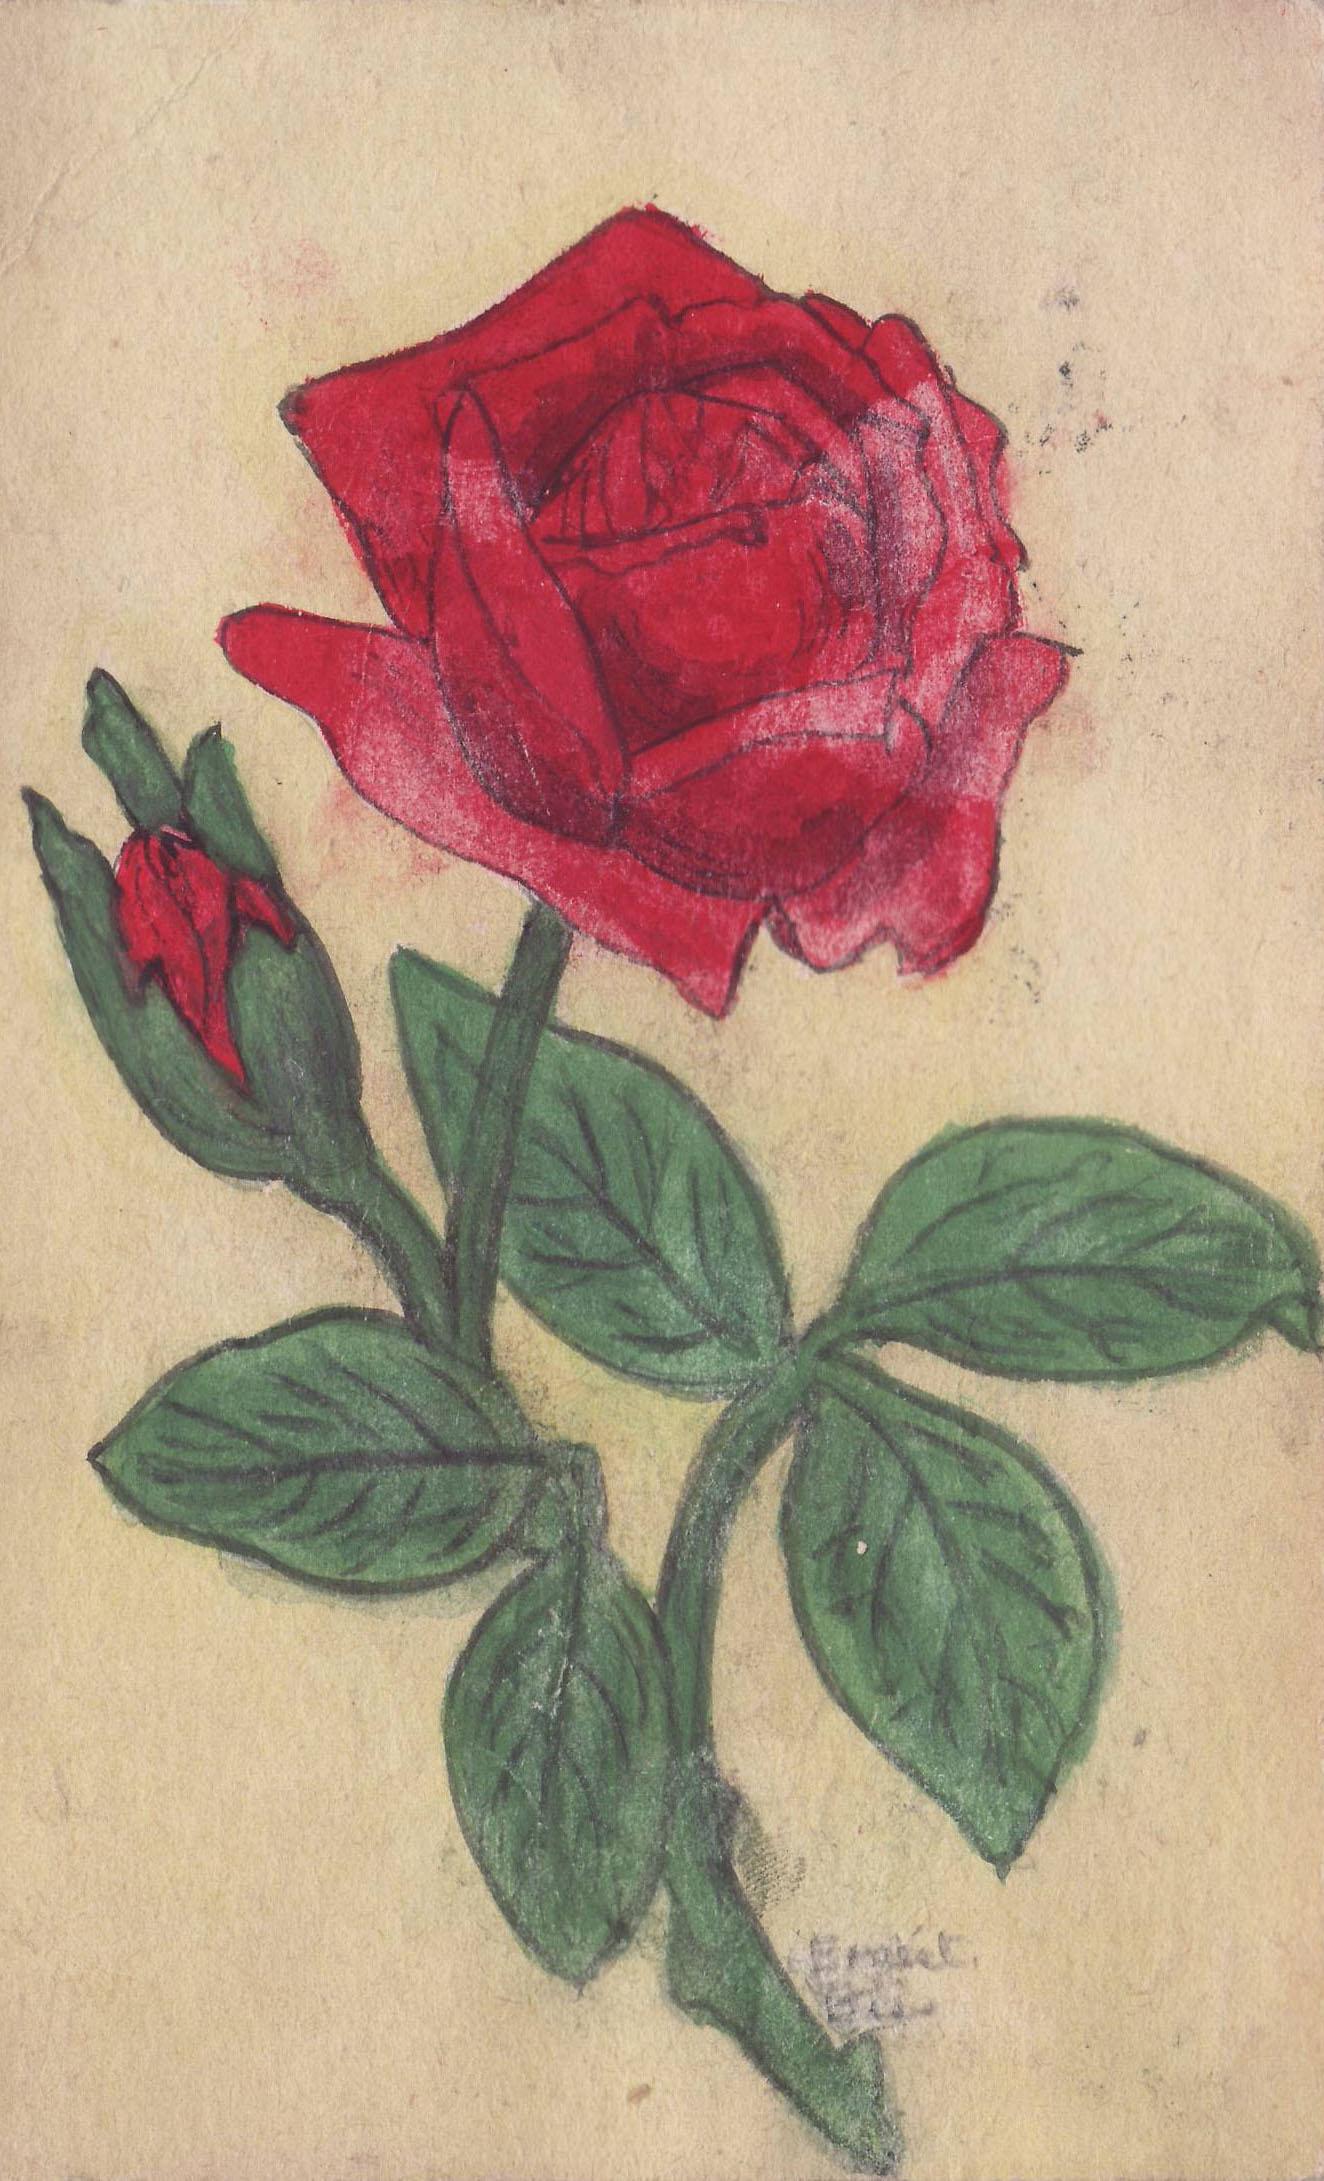 Ernest Biss postcard